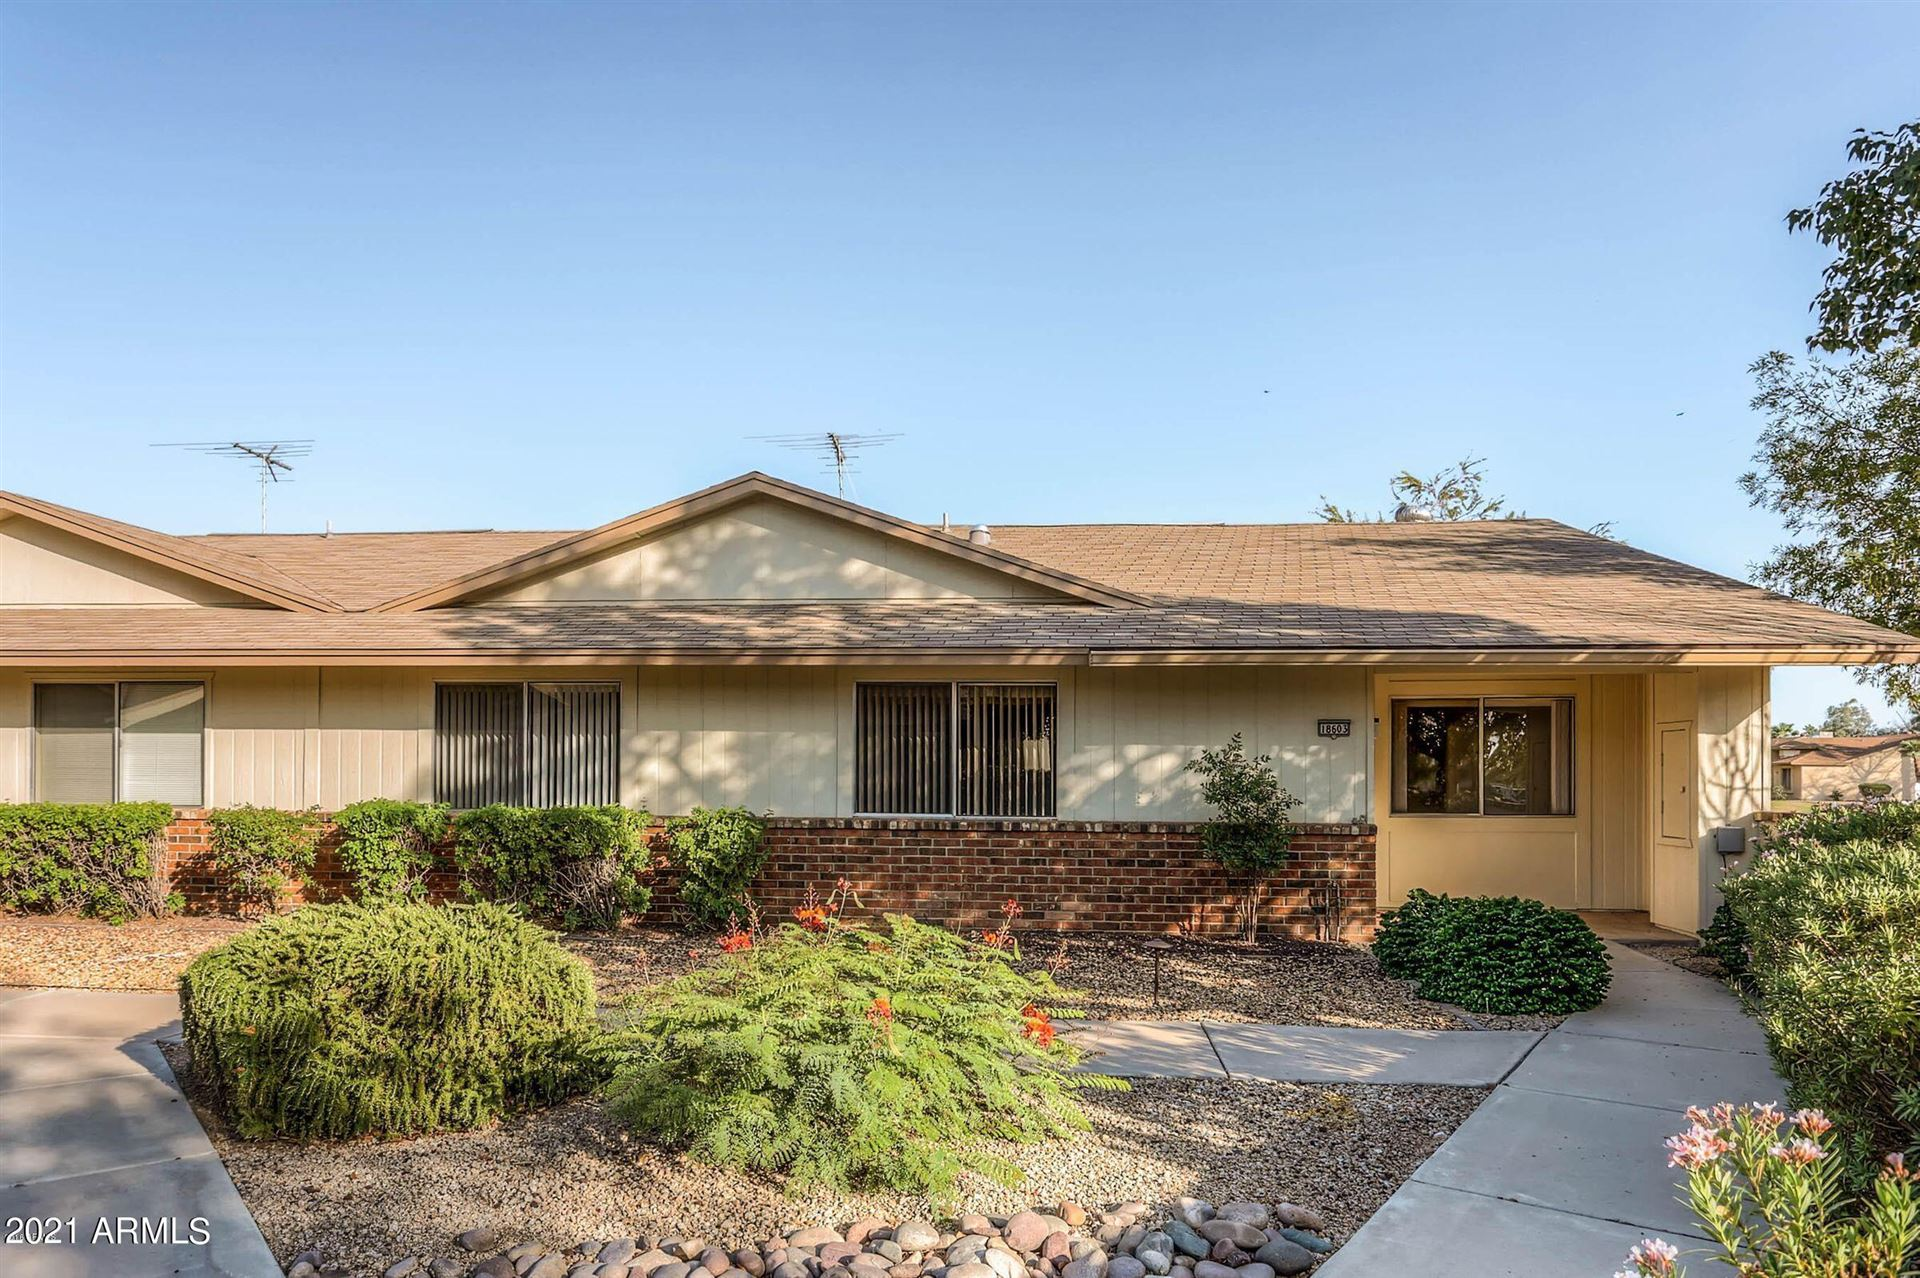 Photo of 18603 N SPANISH GARDEN Drive, Sun City West, AZ 85375 (MLS # 6266969)